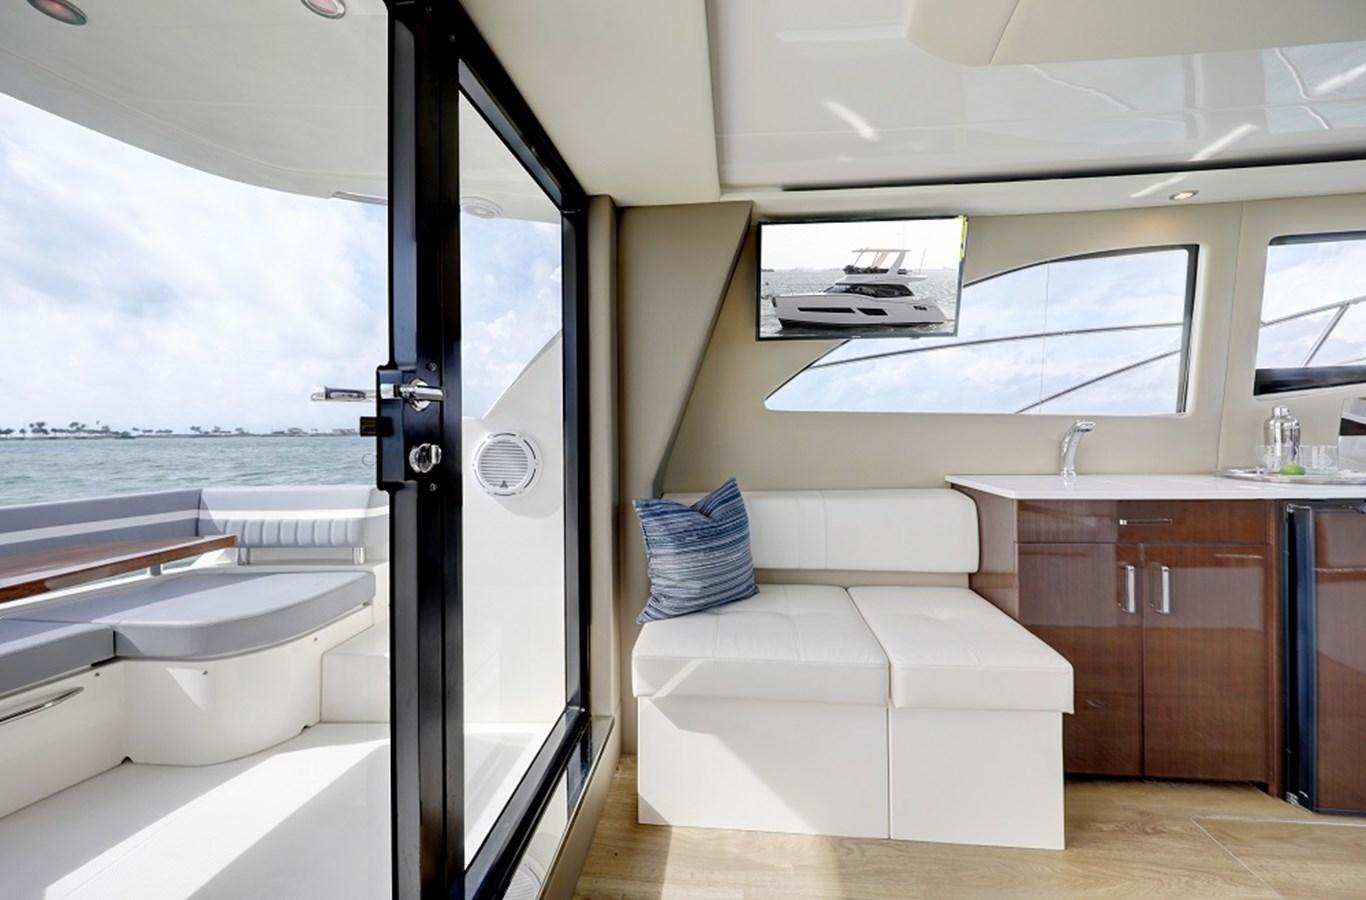 B44A5777_78_79_80_81 2020 CARVER C40 Command Bridge Motor Yacht 2825091